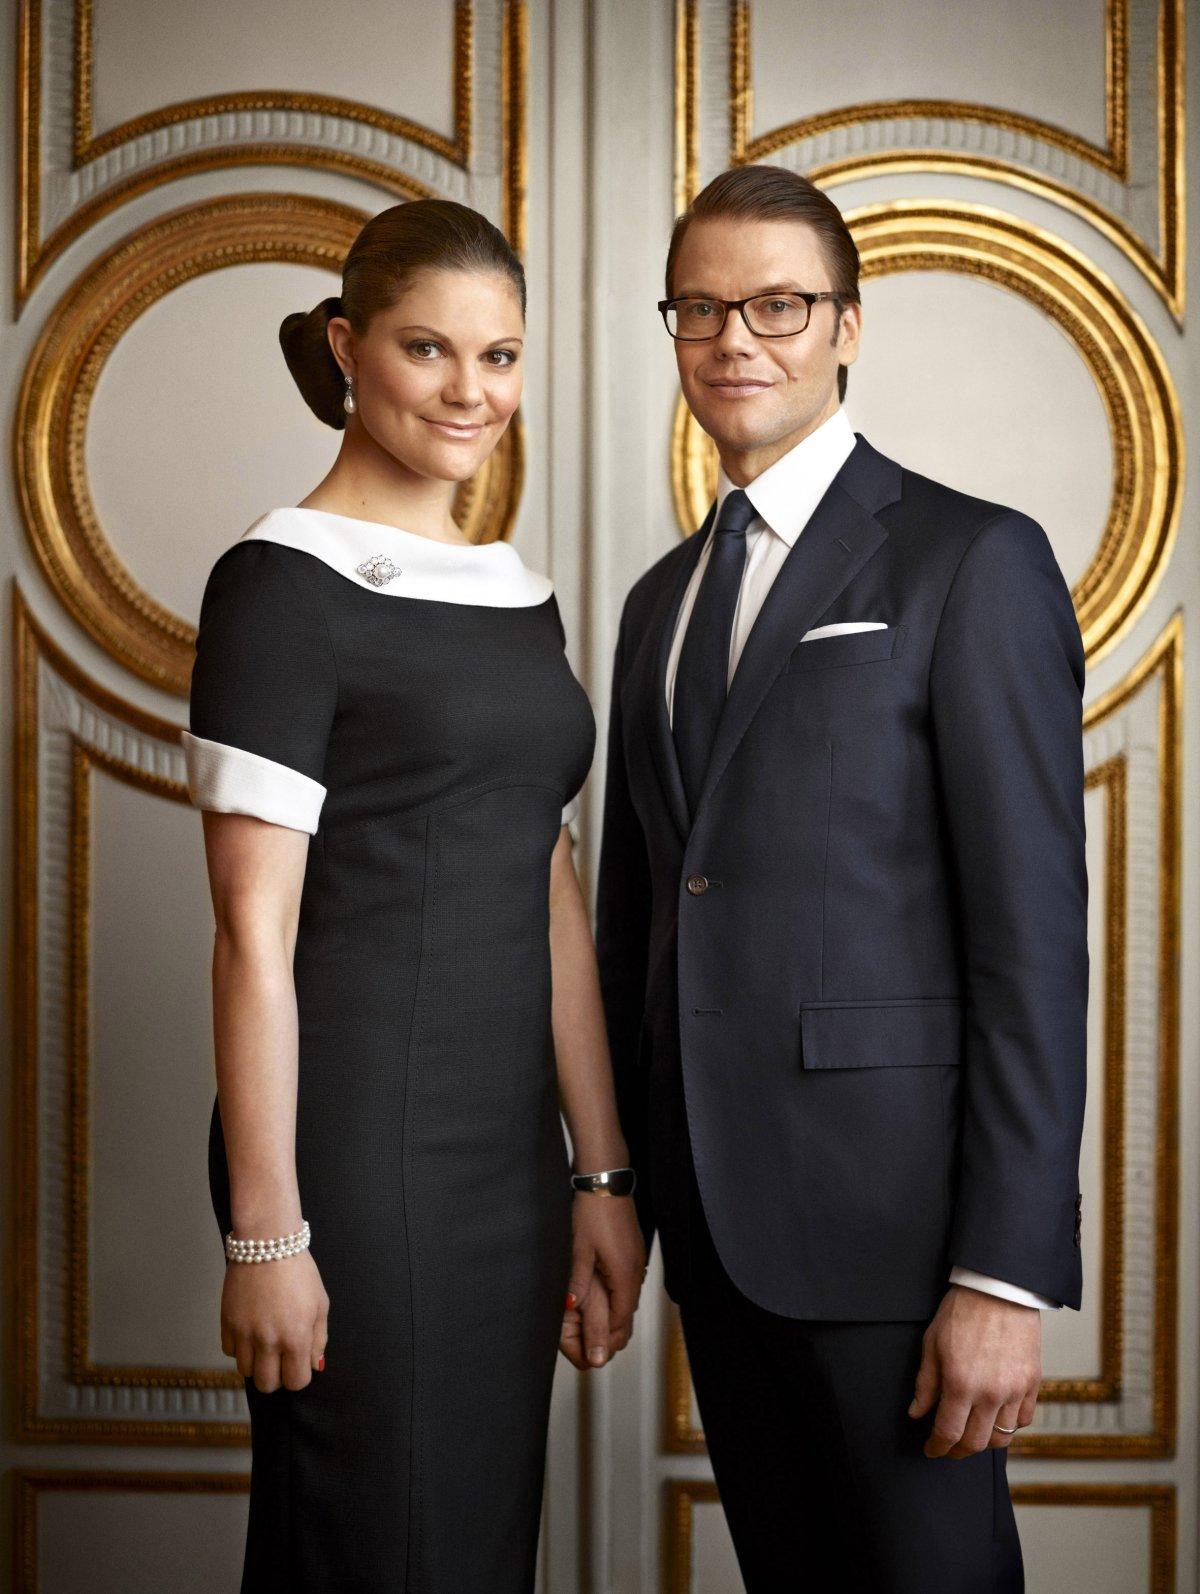 Formal portrait of Crown Princess Victoria and Prince Daniel of Sweden